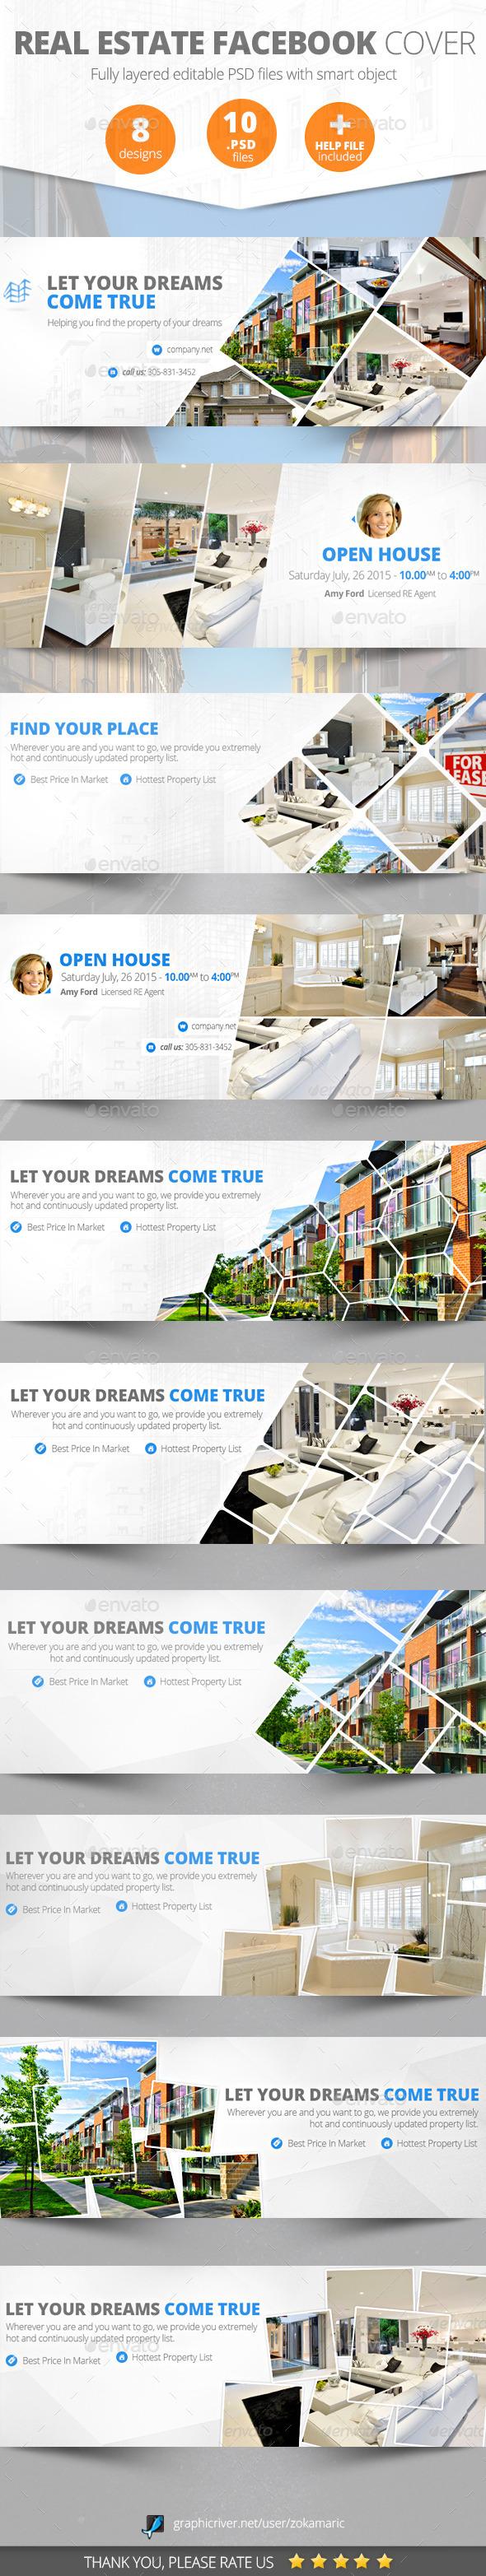 GraphicRiver Real Estate Facebook Cover 10113017